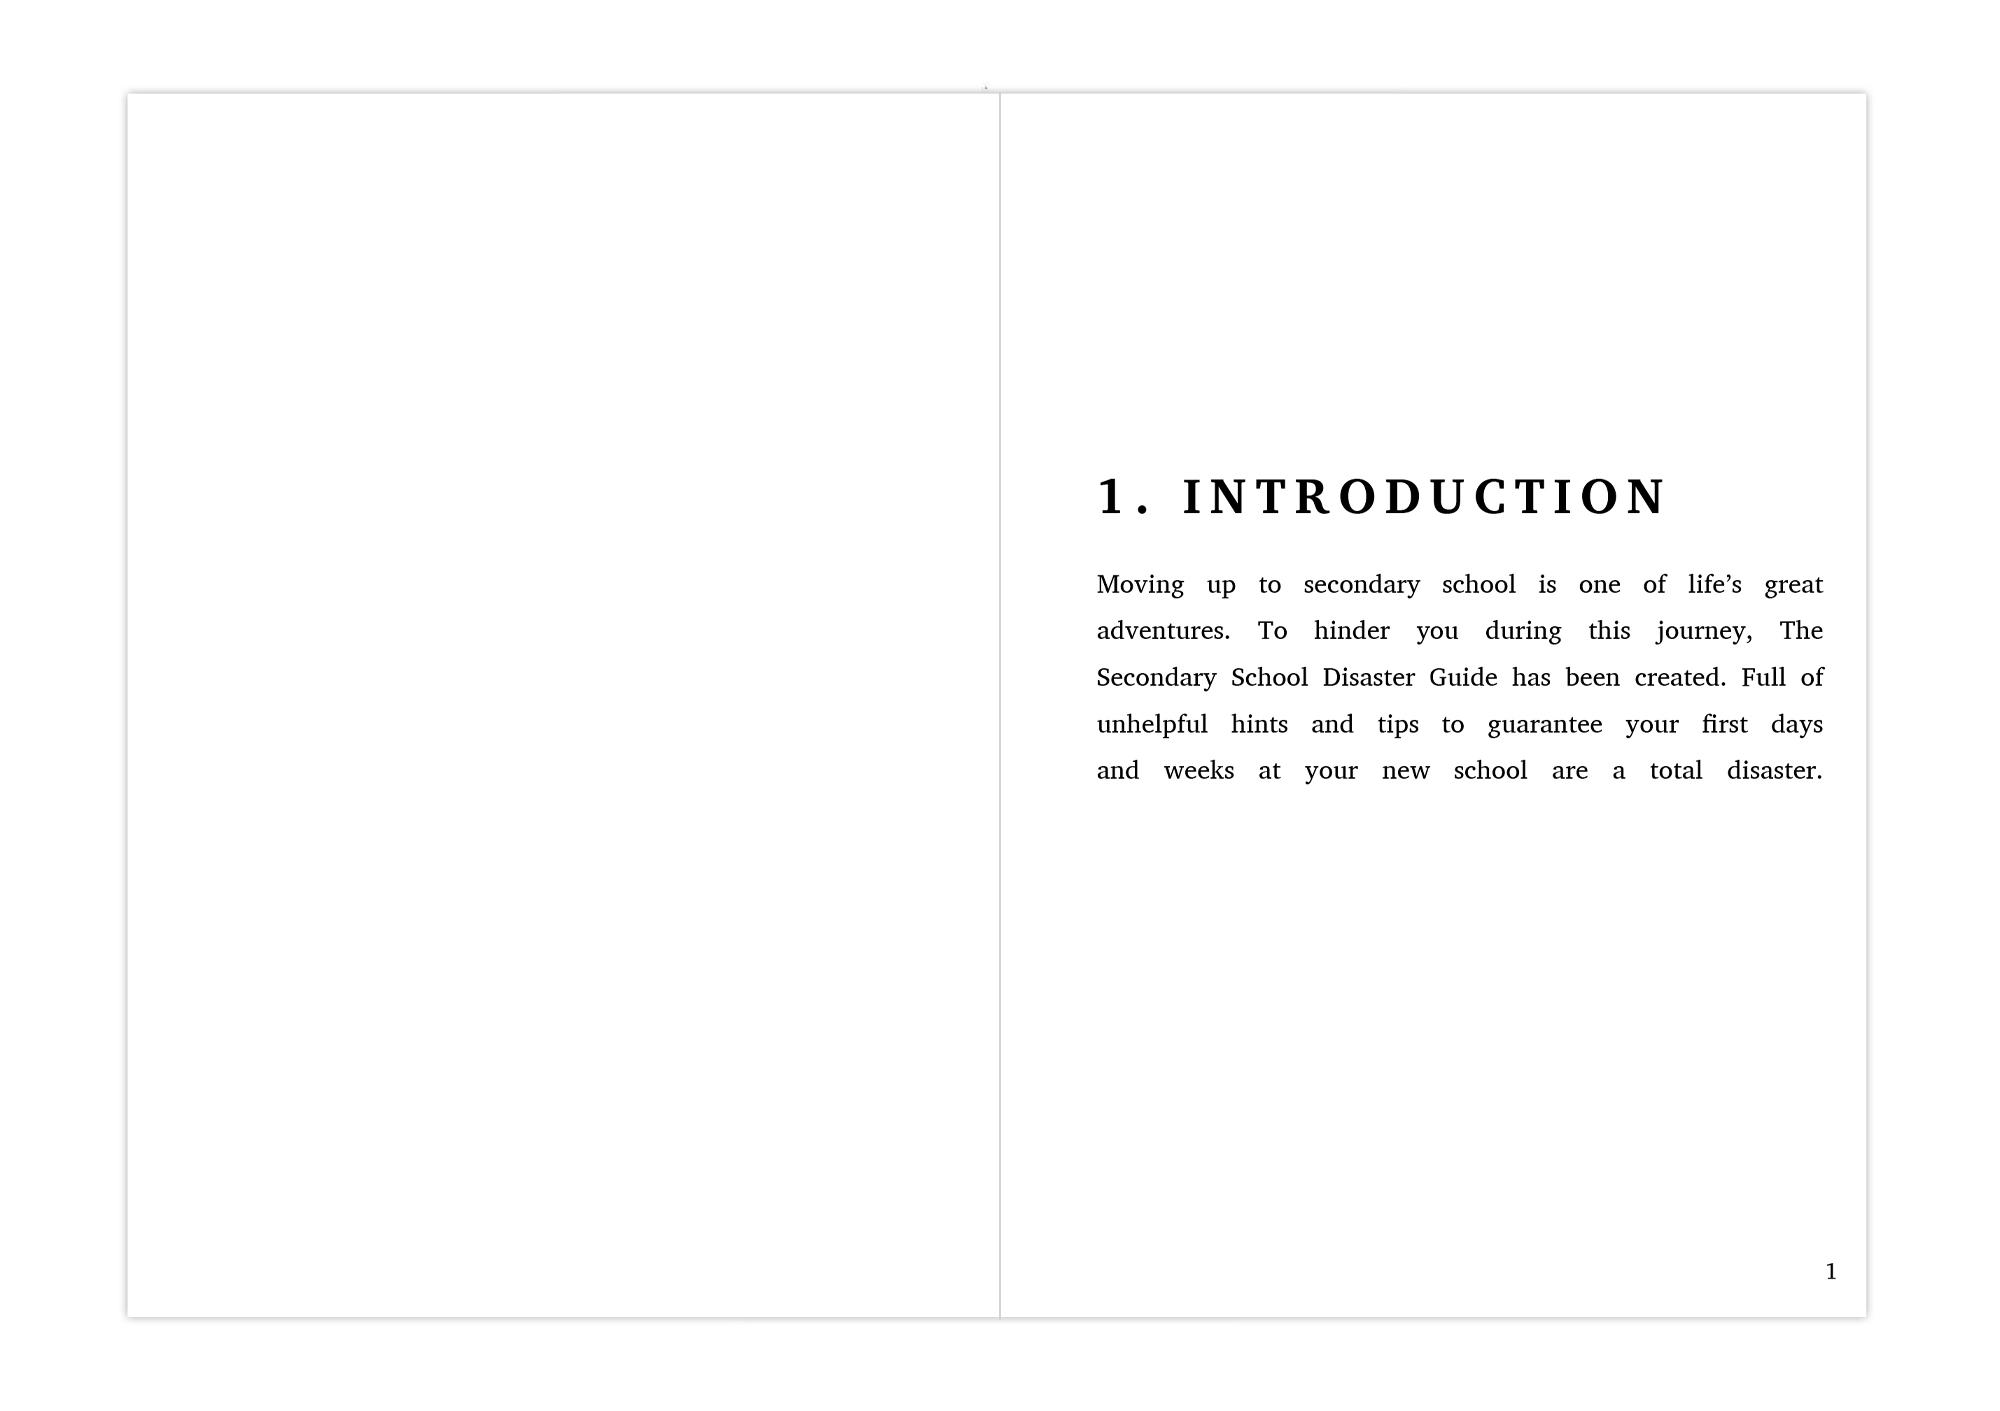 DG-spread-introduction.jpg